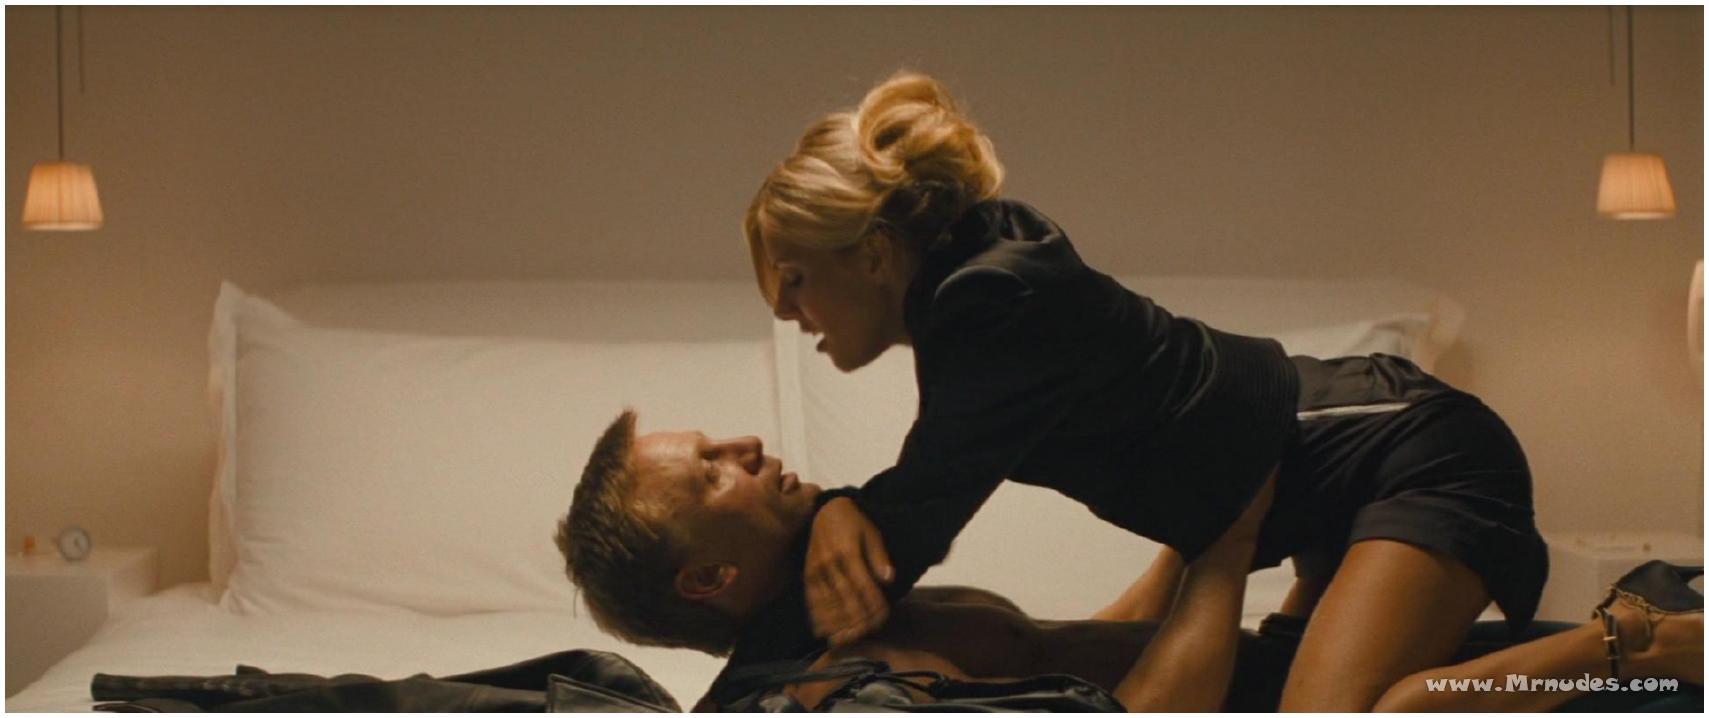 Sienna miller порно сцены